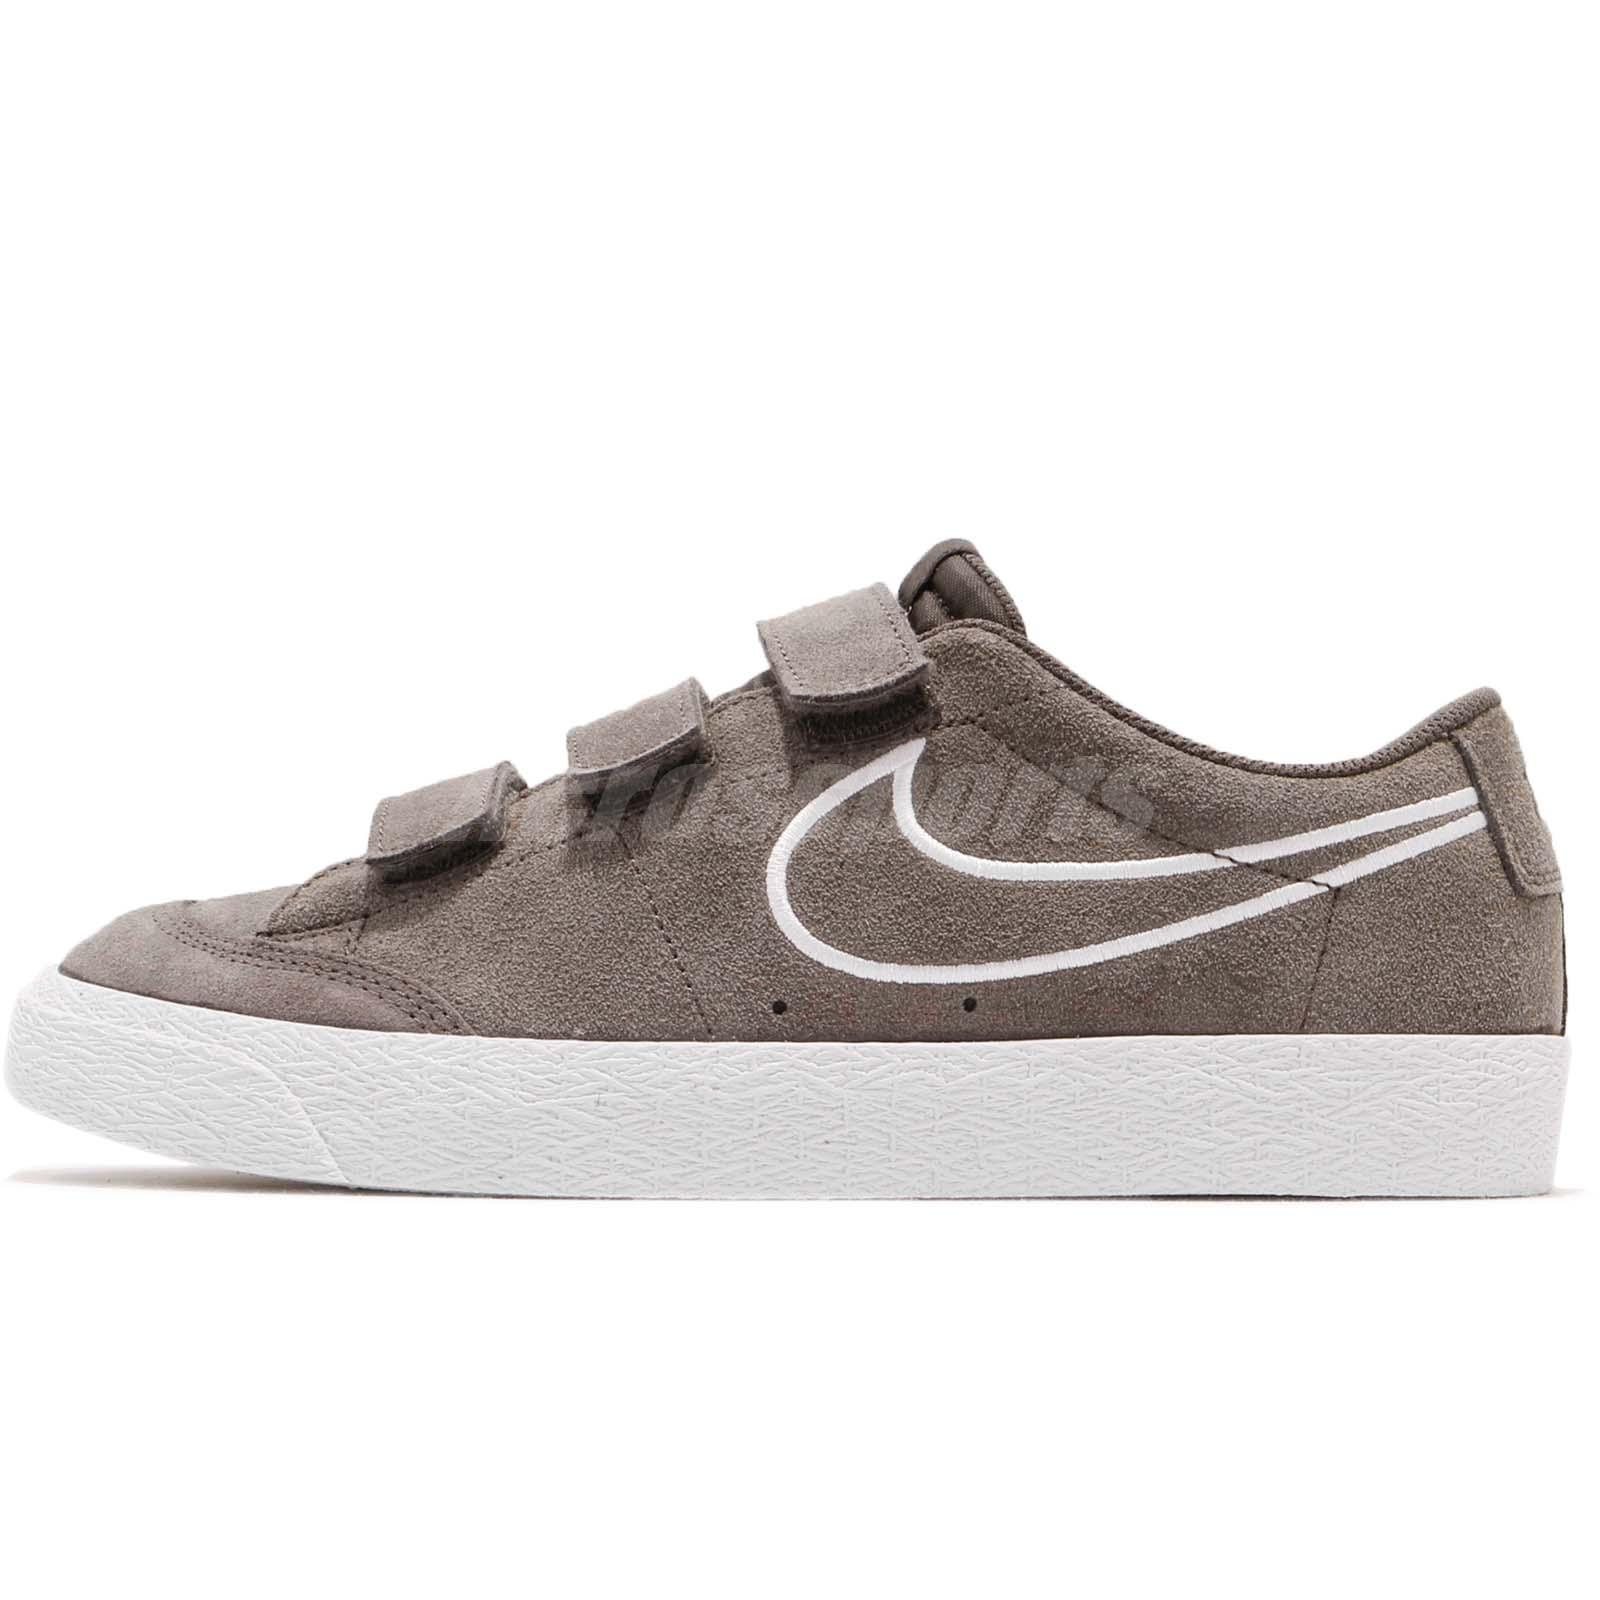 brand new 4d39d 7019e Nike SB Zoom Blazer AC XT Ridgerock Fossil Men Skate Boarding Shoes AH3434- 200